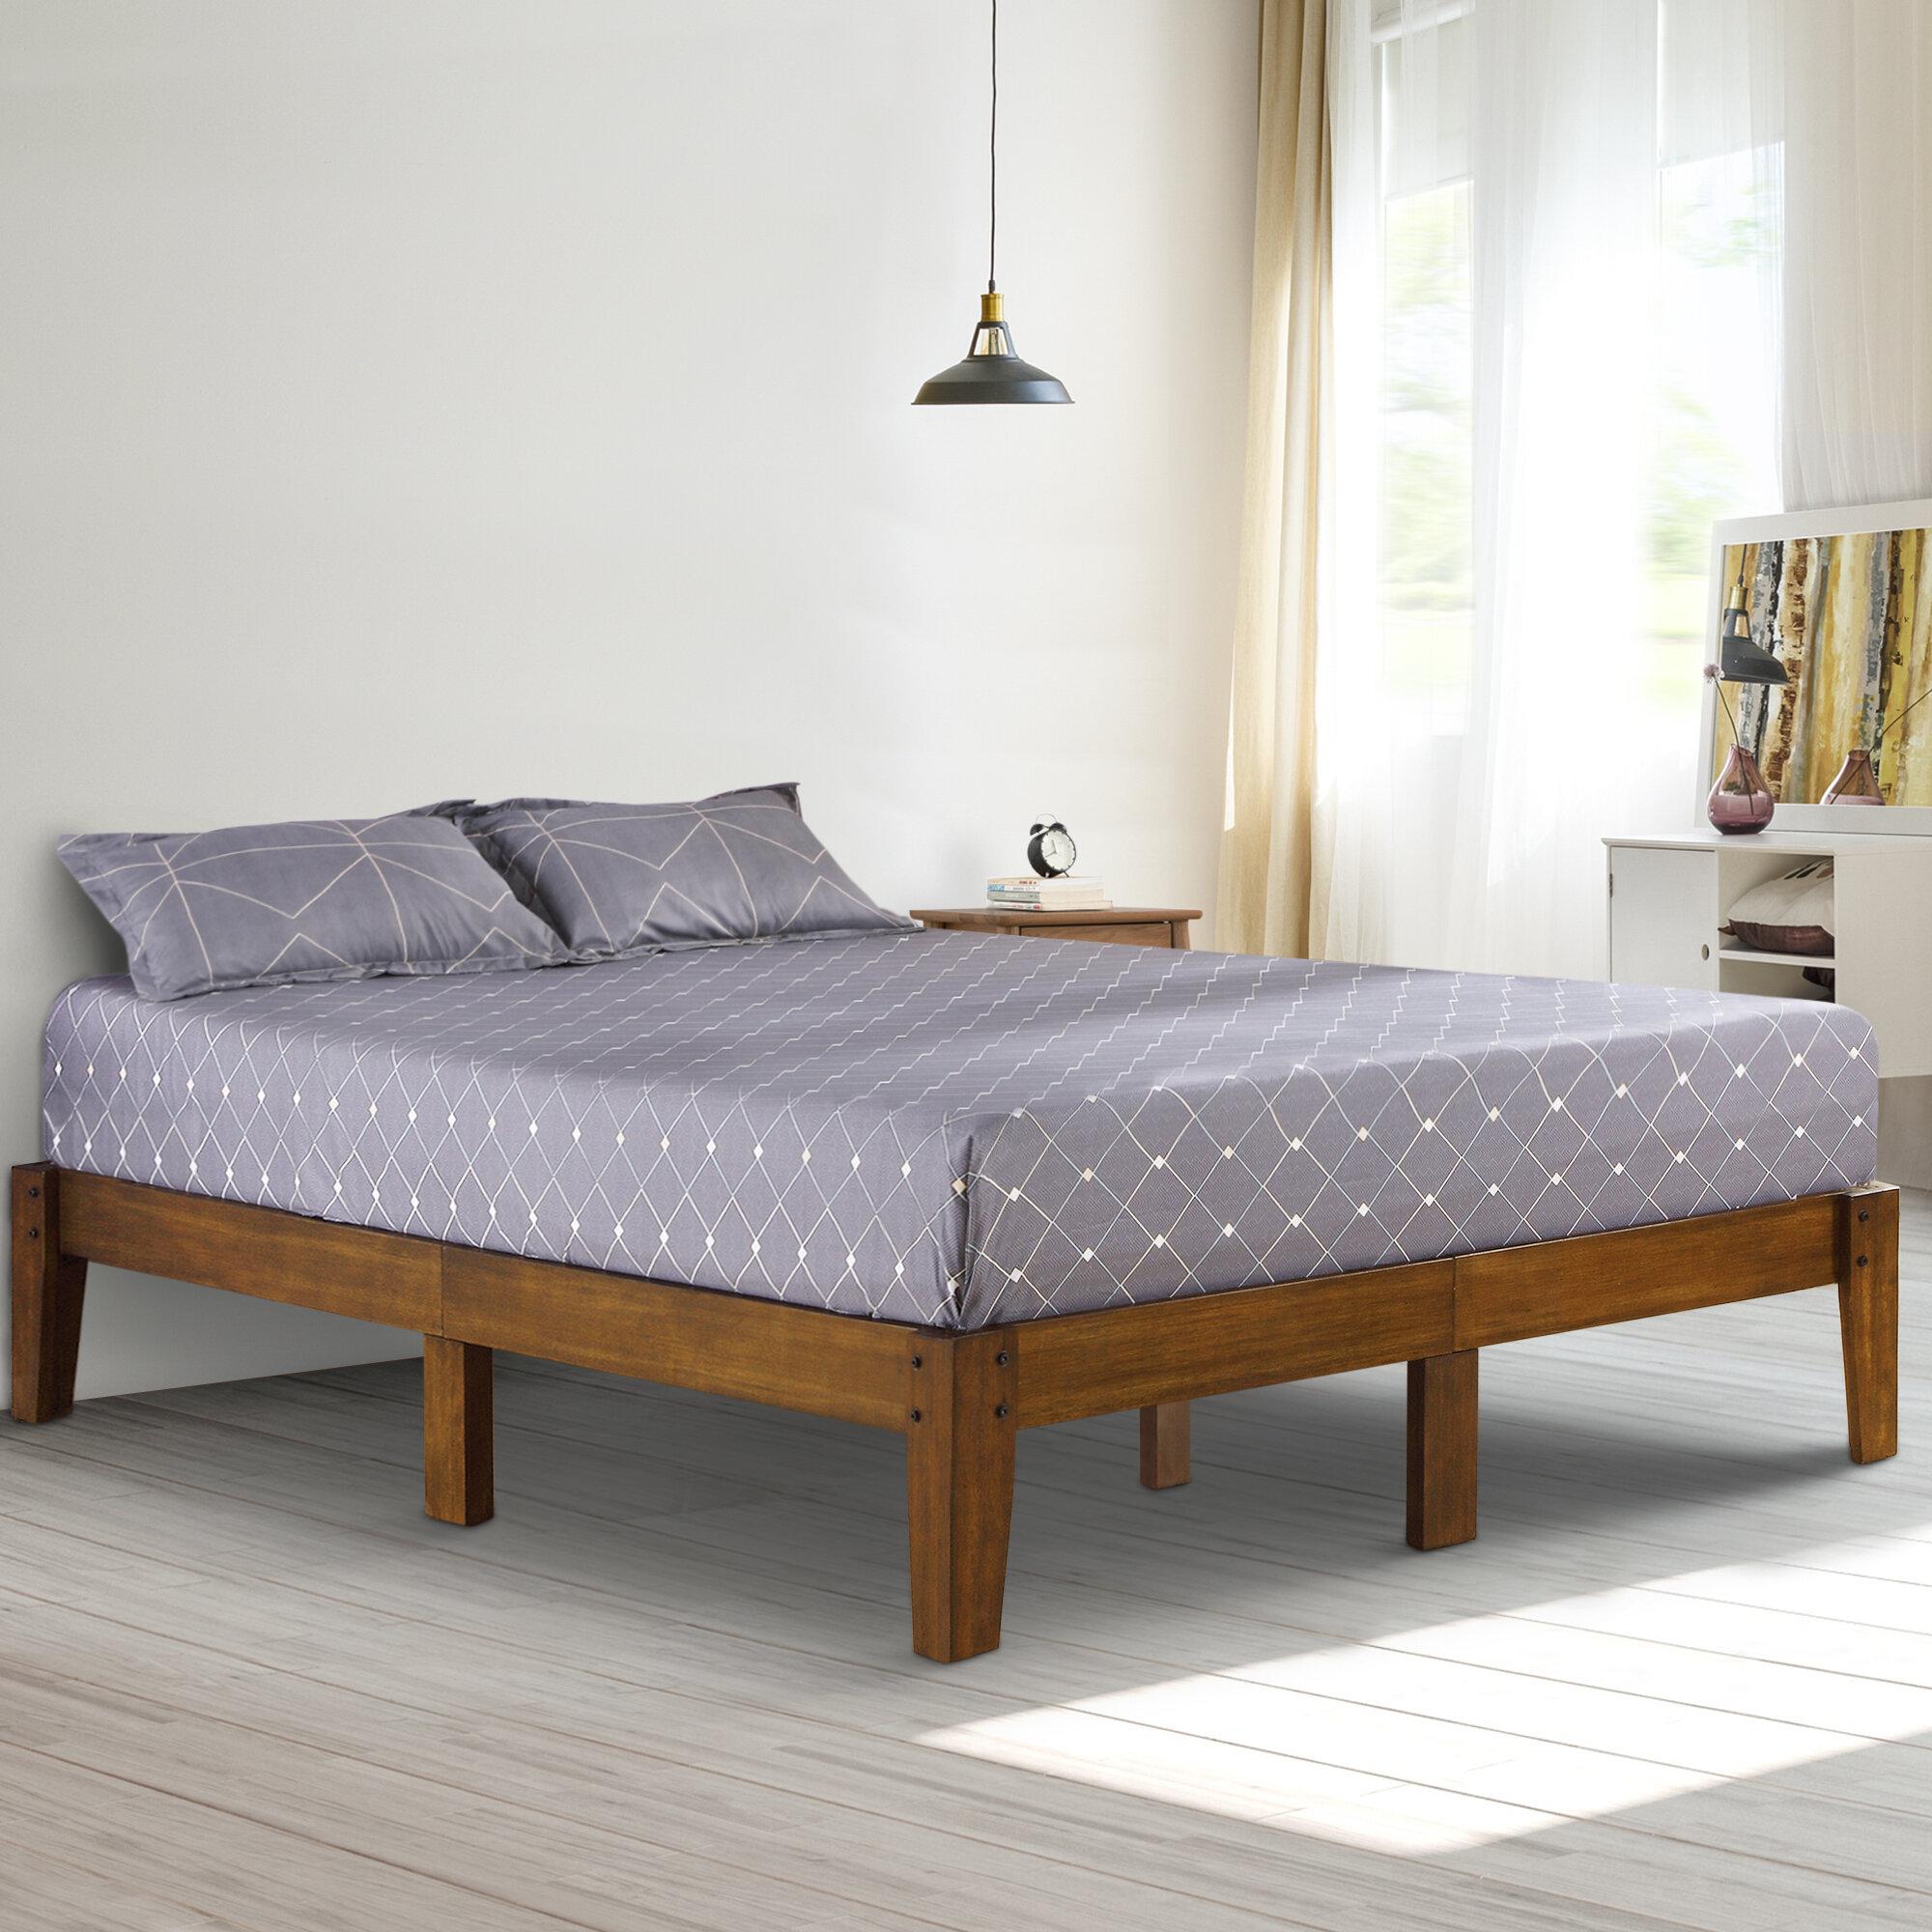 Queen Size Ebern Designs Platform Beds You Ll Love In 2021 Wayfair